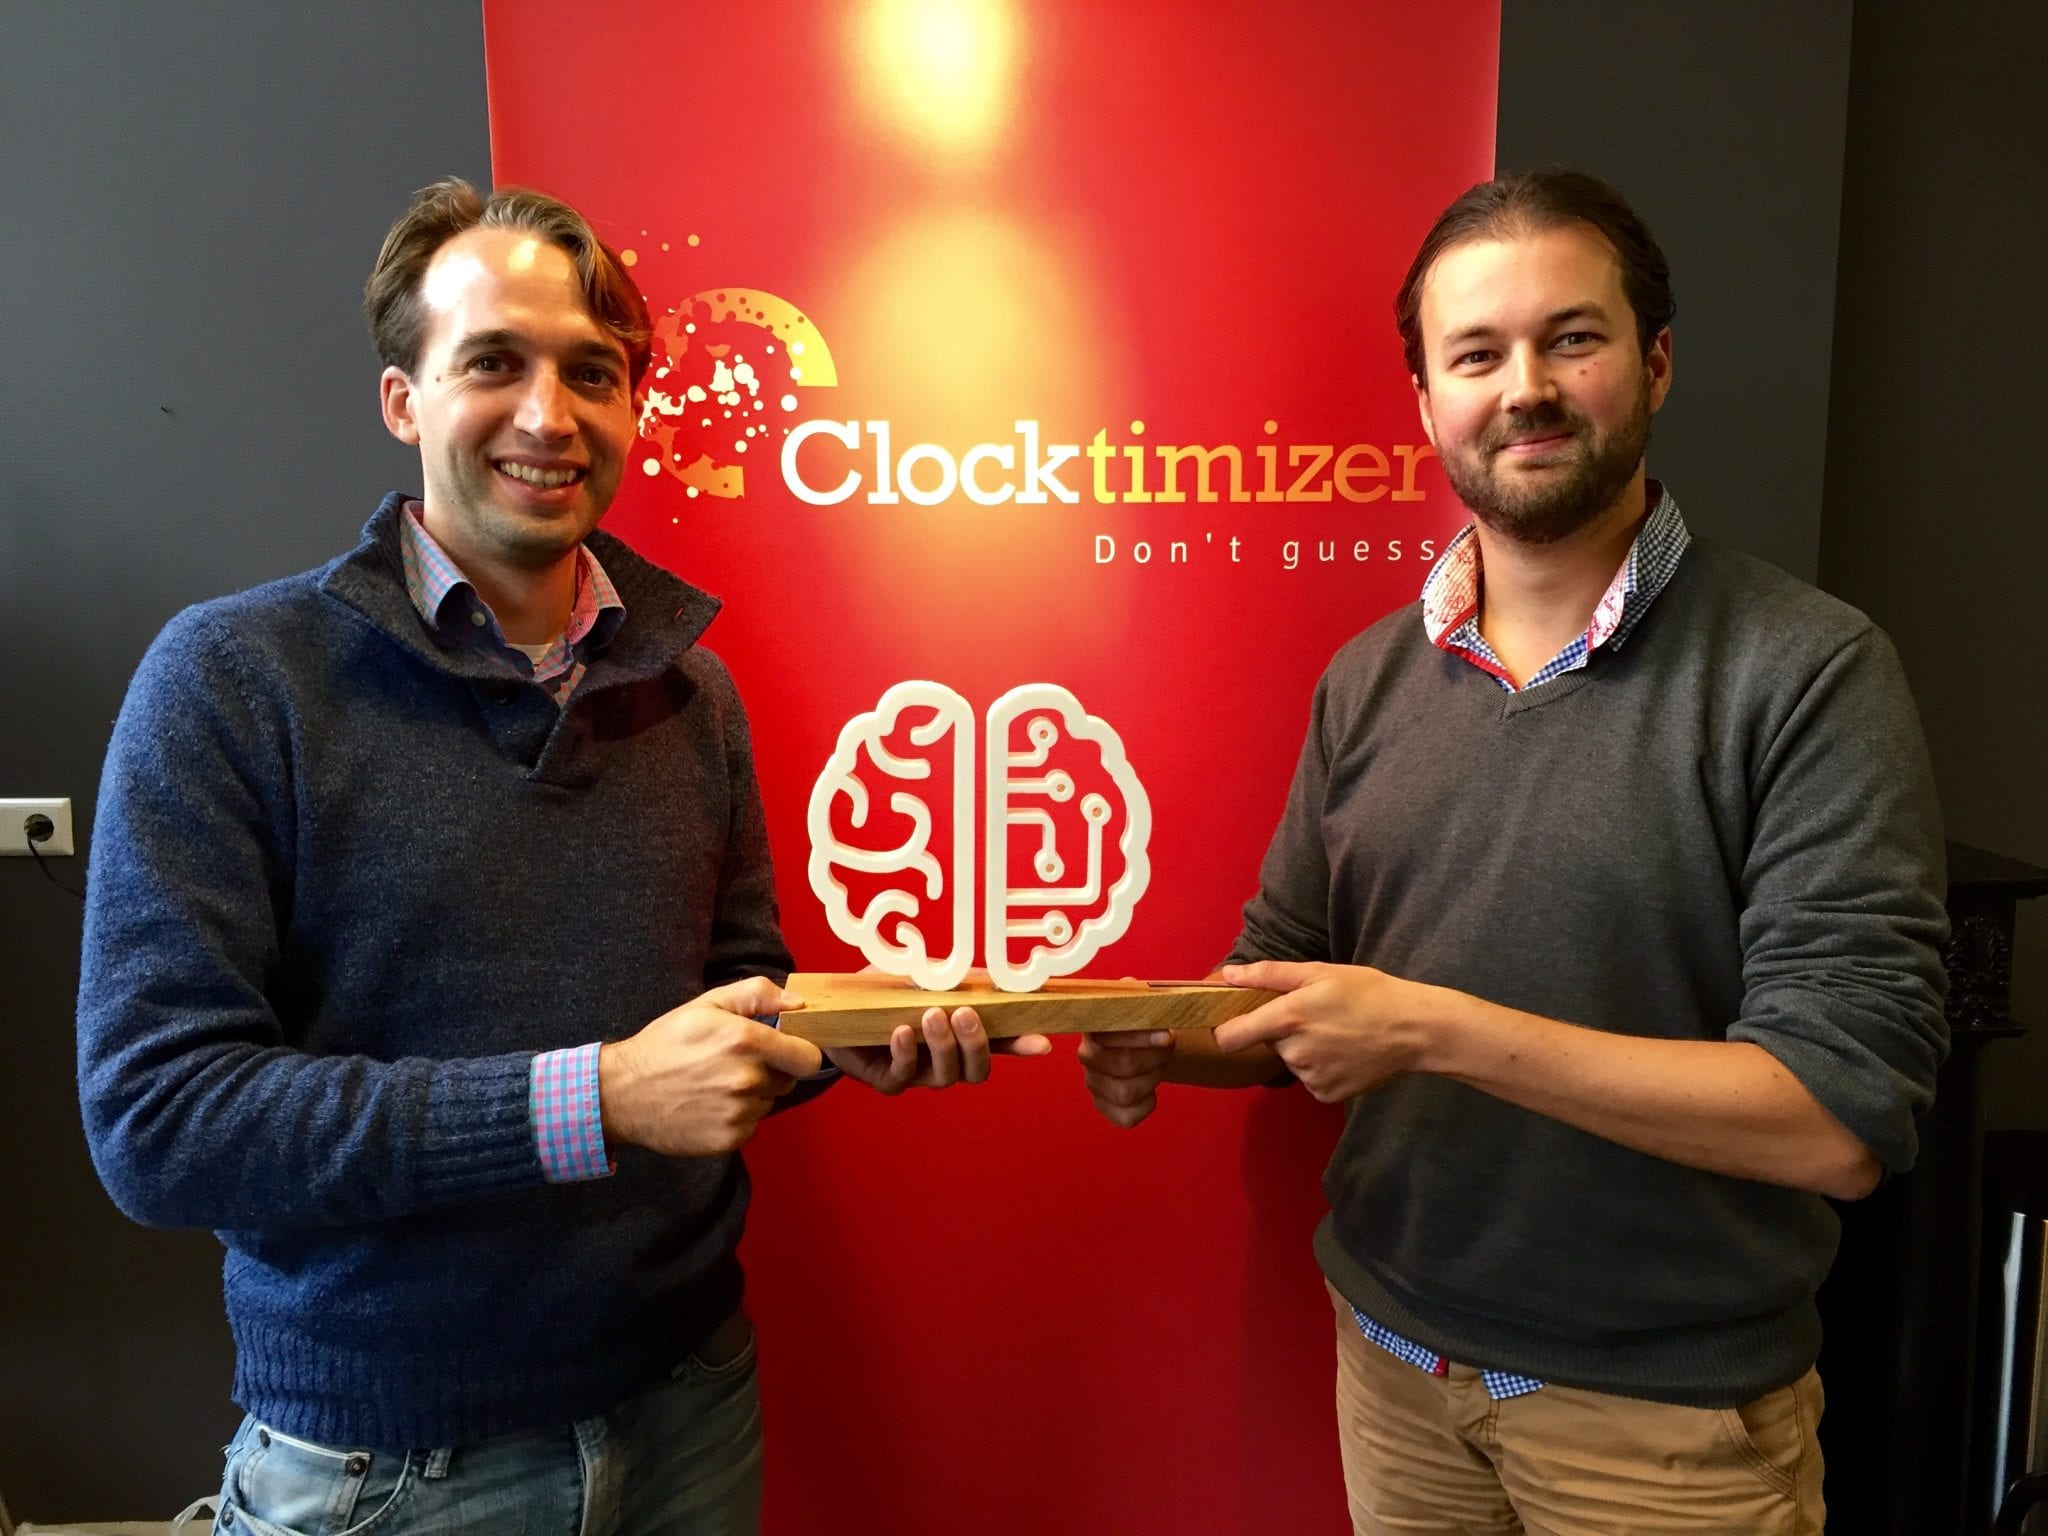 Utrechtse startup Clocktimizer winnaar van Legal Tech Startup Award